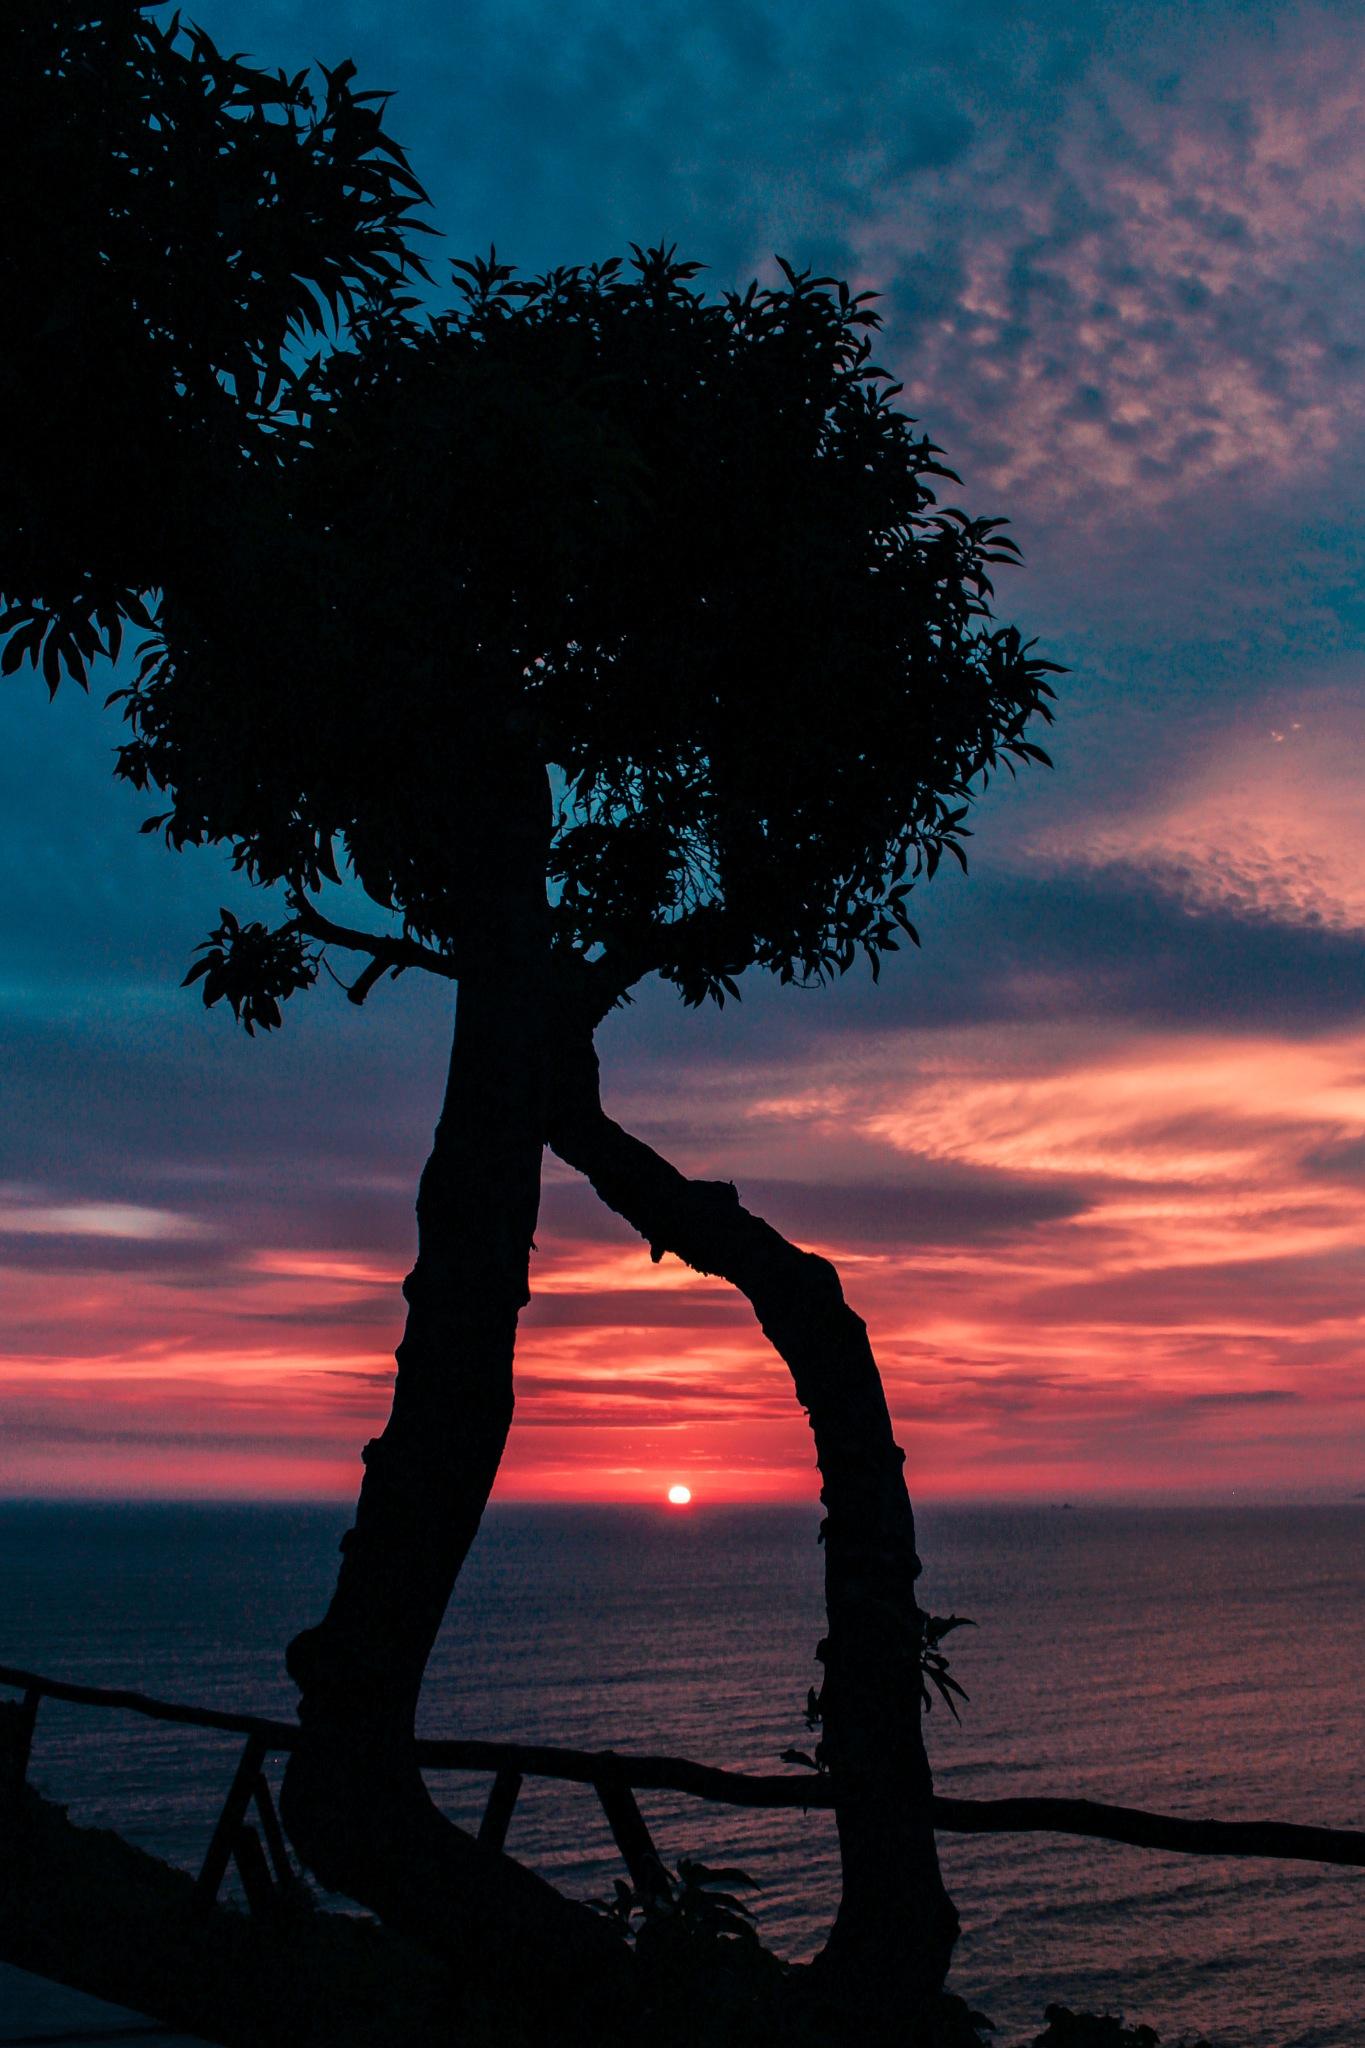 Sunset by Roberto Alarcón Jara